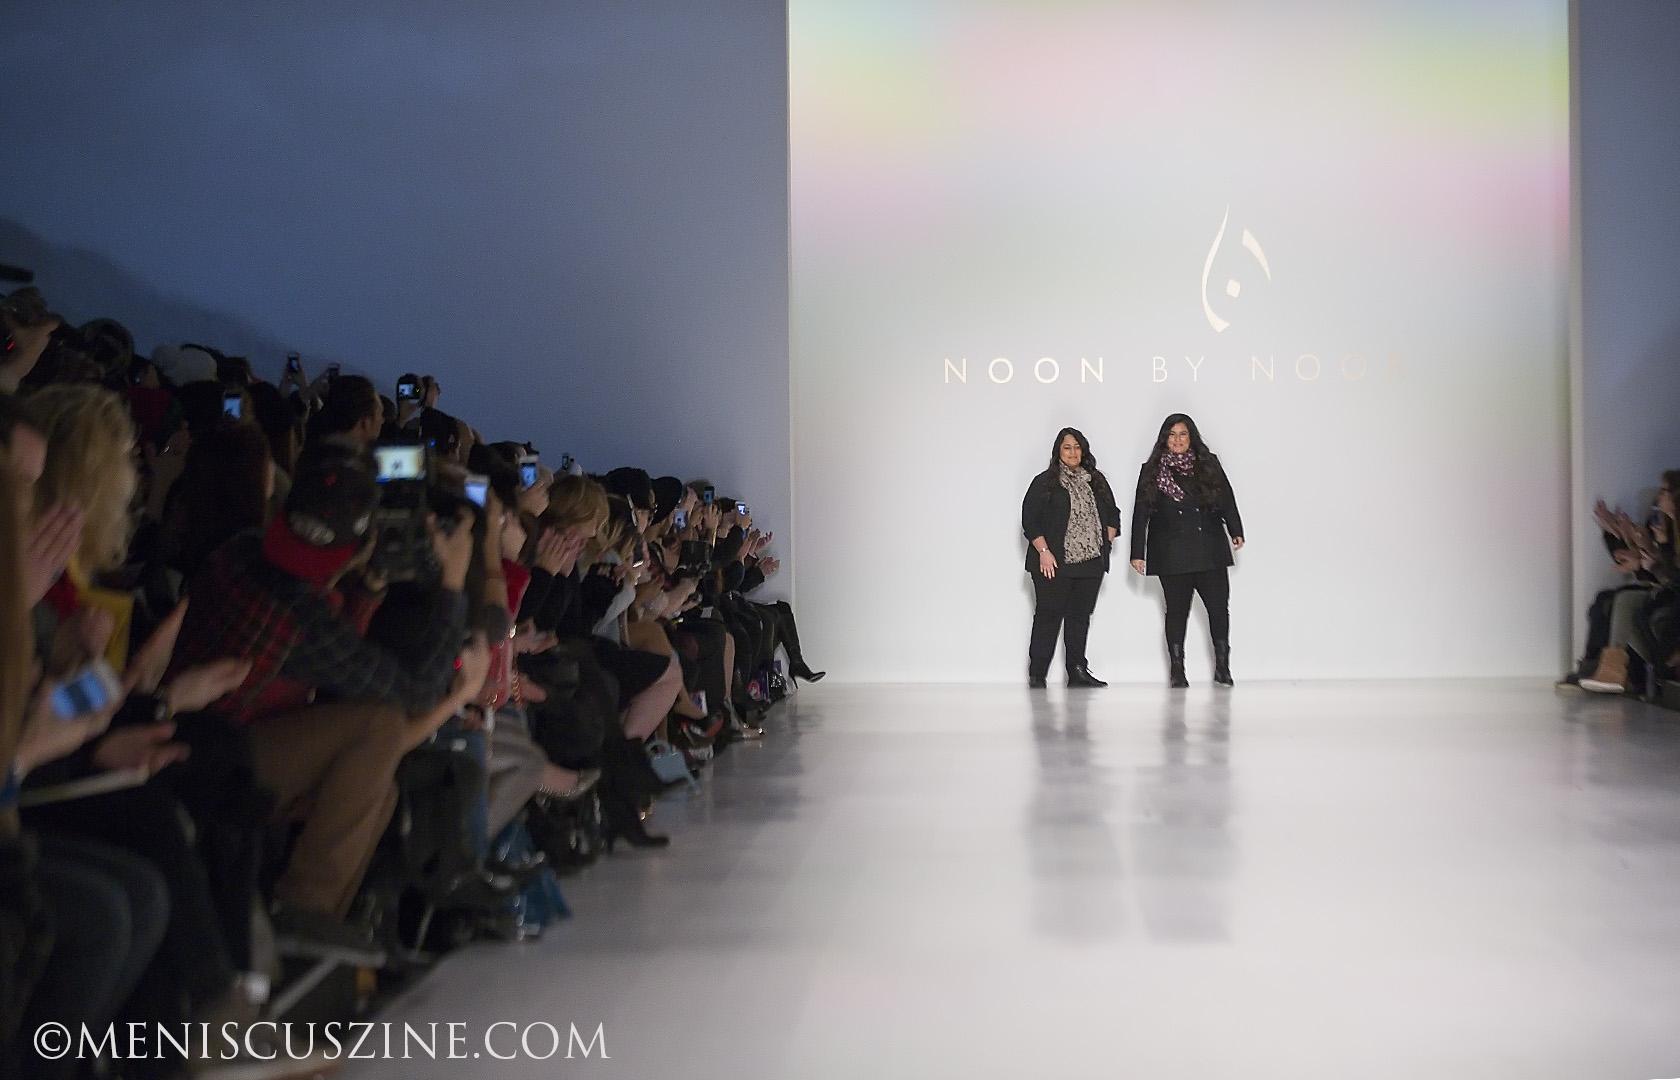 Cousins Shaikha Haya Al Khalifa and Shaikha Noor Al Khalifa head the Bahraini fashion label Noon by Noor. (photo by Kwai Chan / Meniscus Magazine)